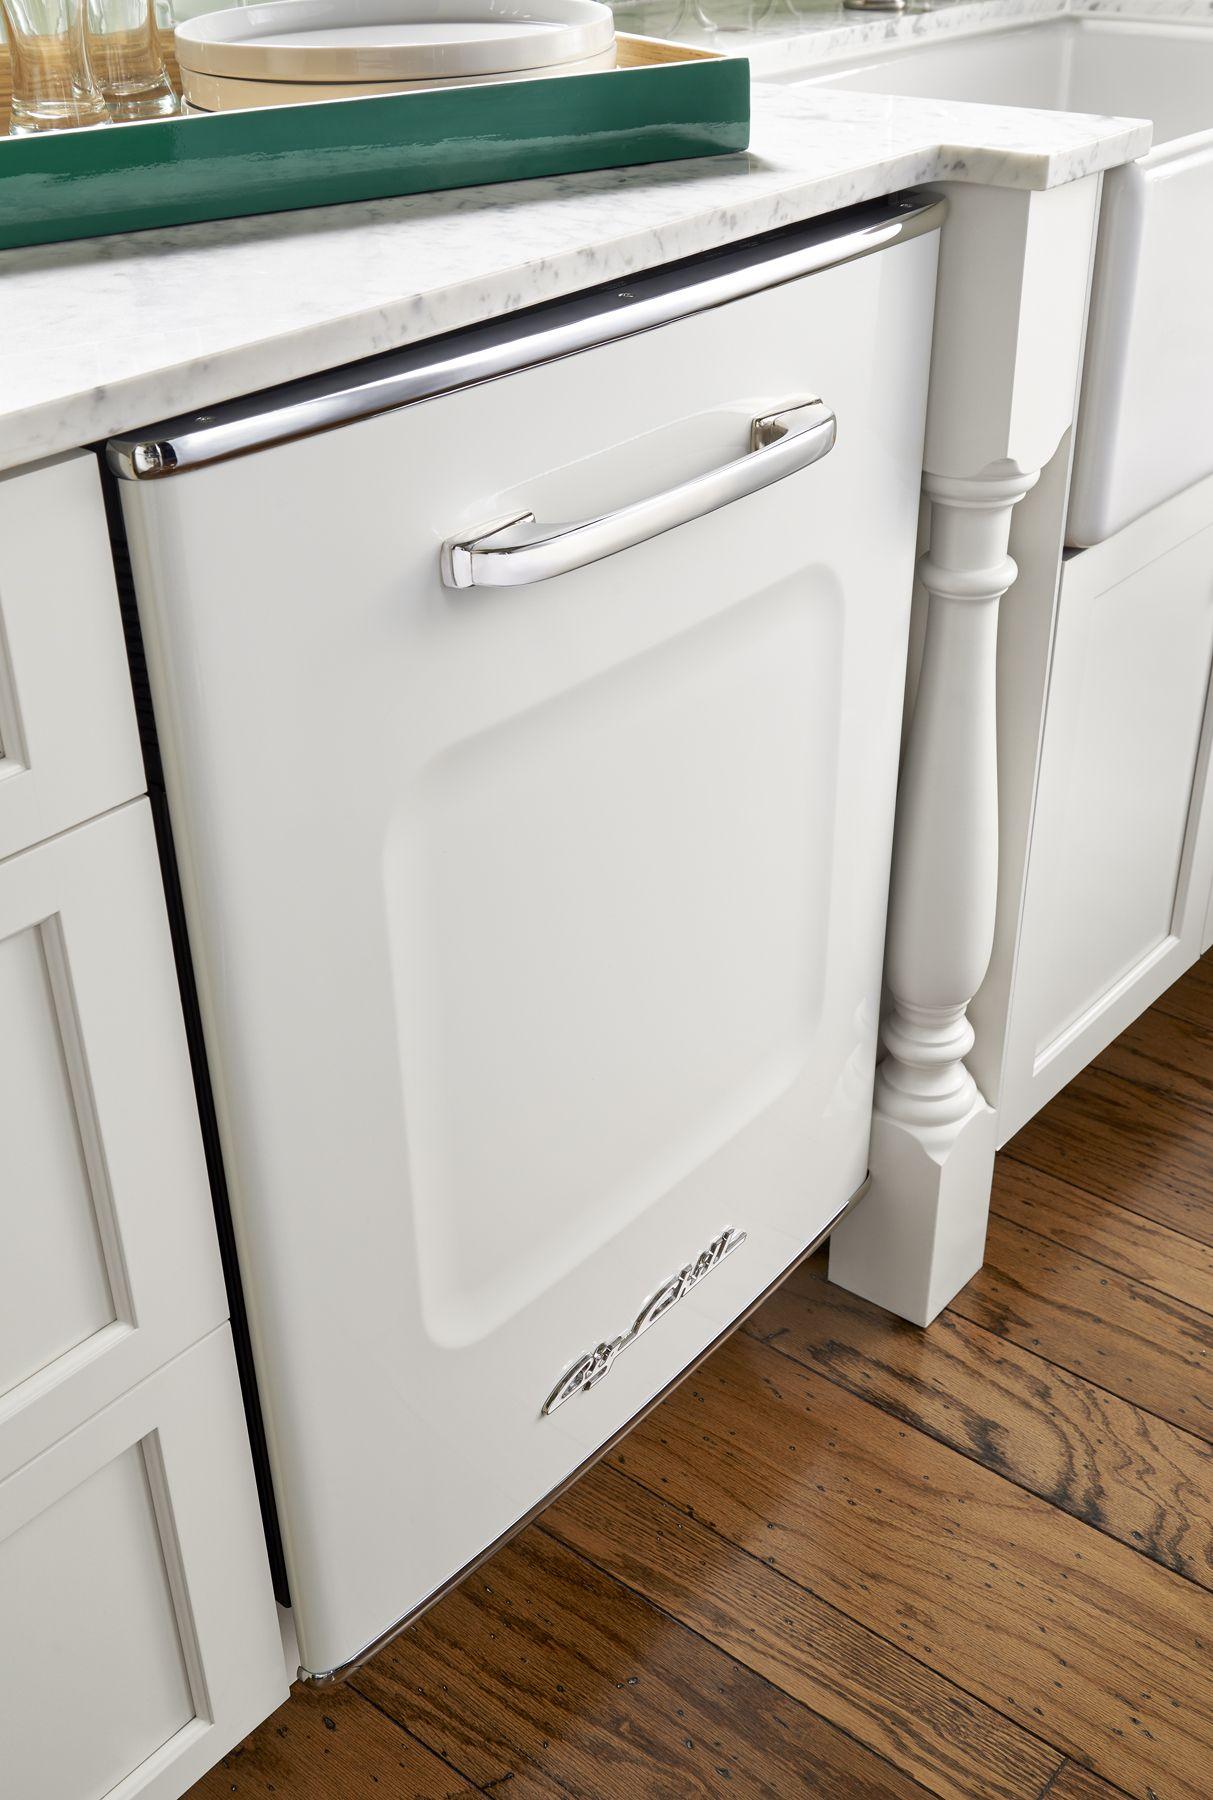 Retro Dishwasher Panel Retro Appliances Kitchen Design Decor